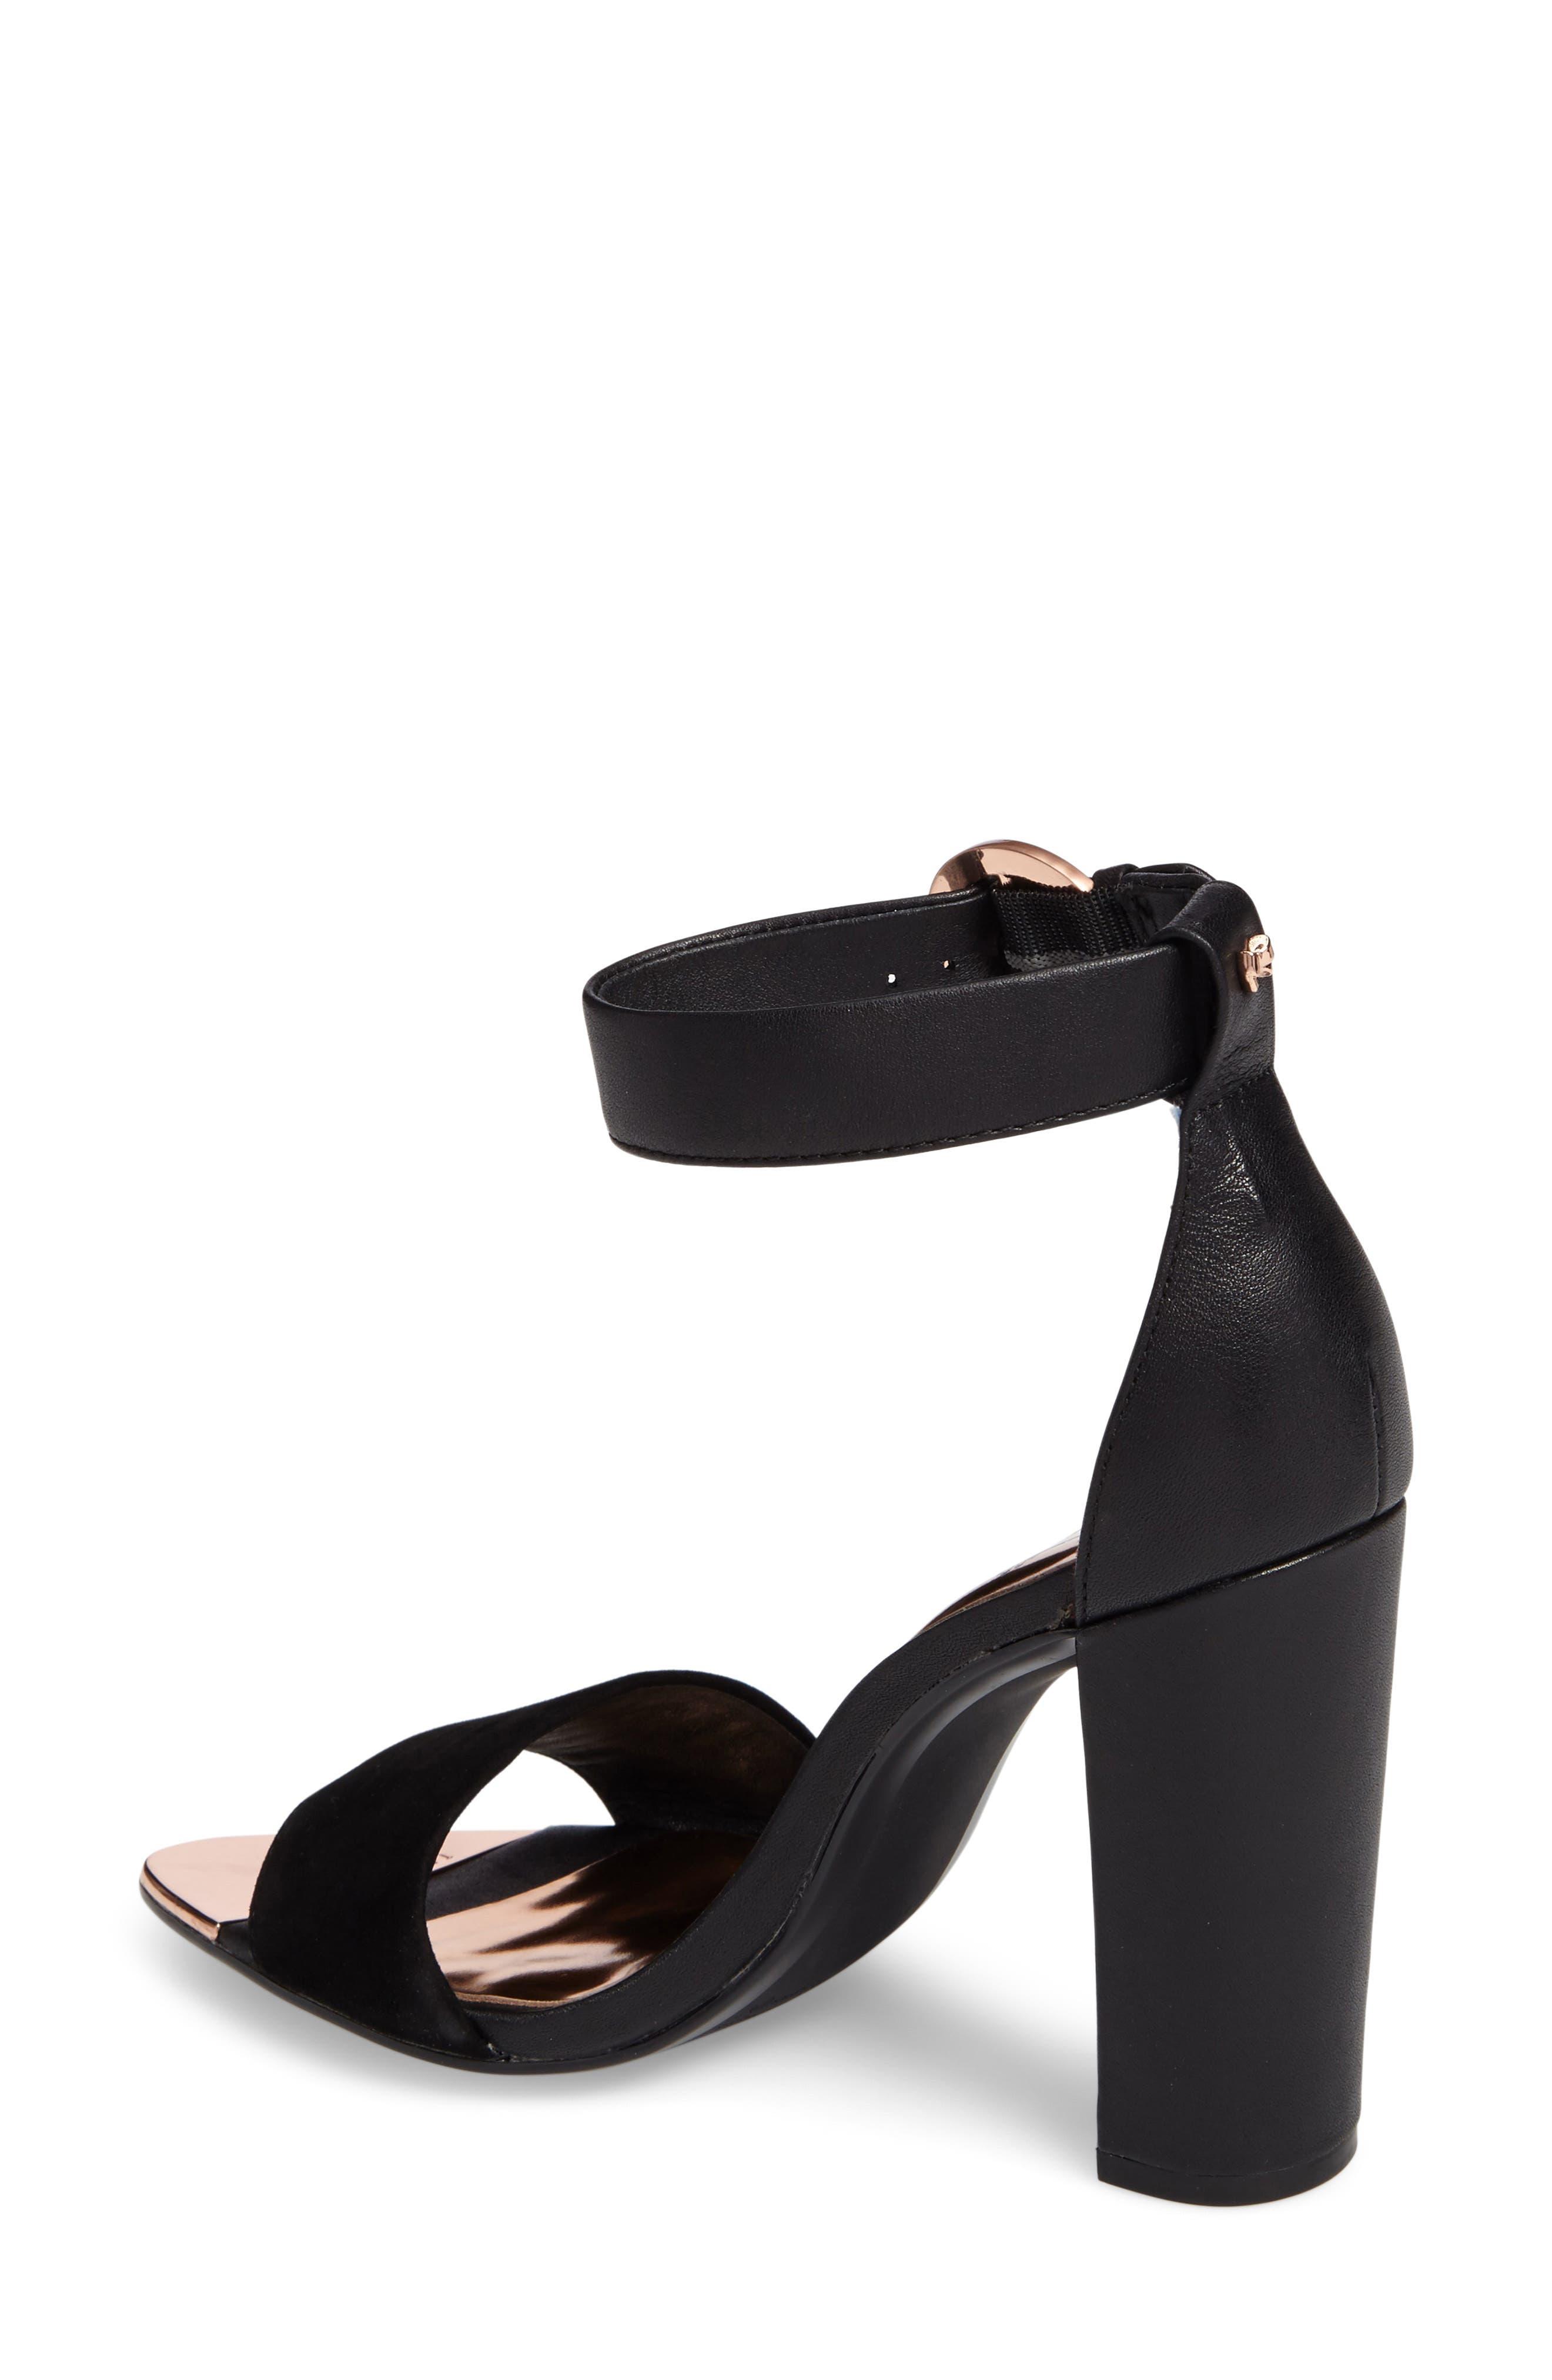 Secoa Ankle Strap Sandal,                             Alternate thumbnail 2, color,                             010